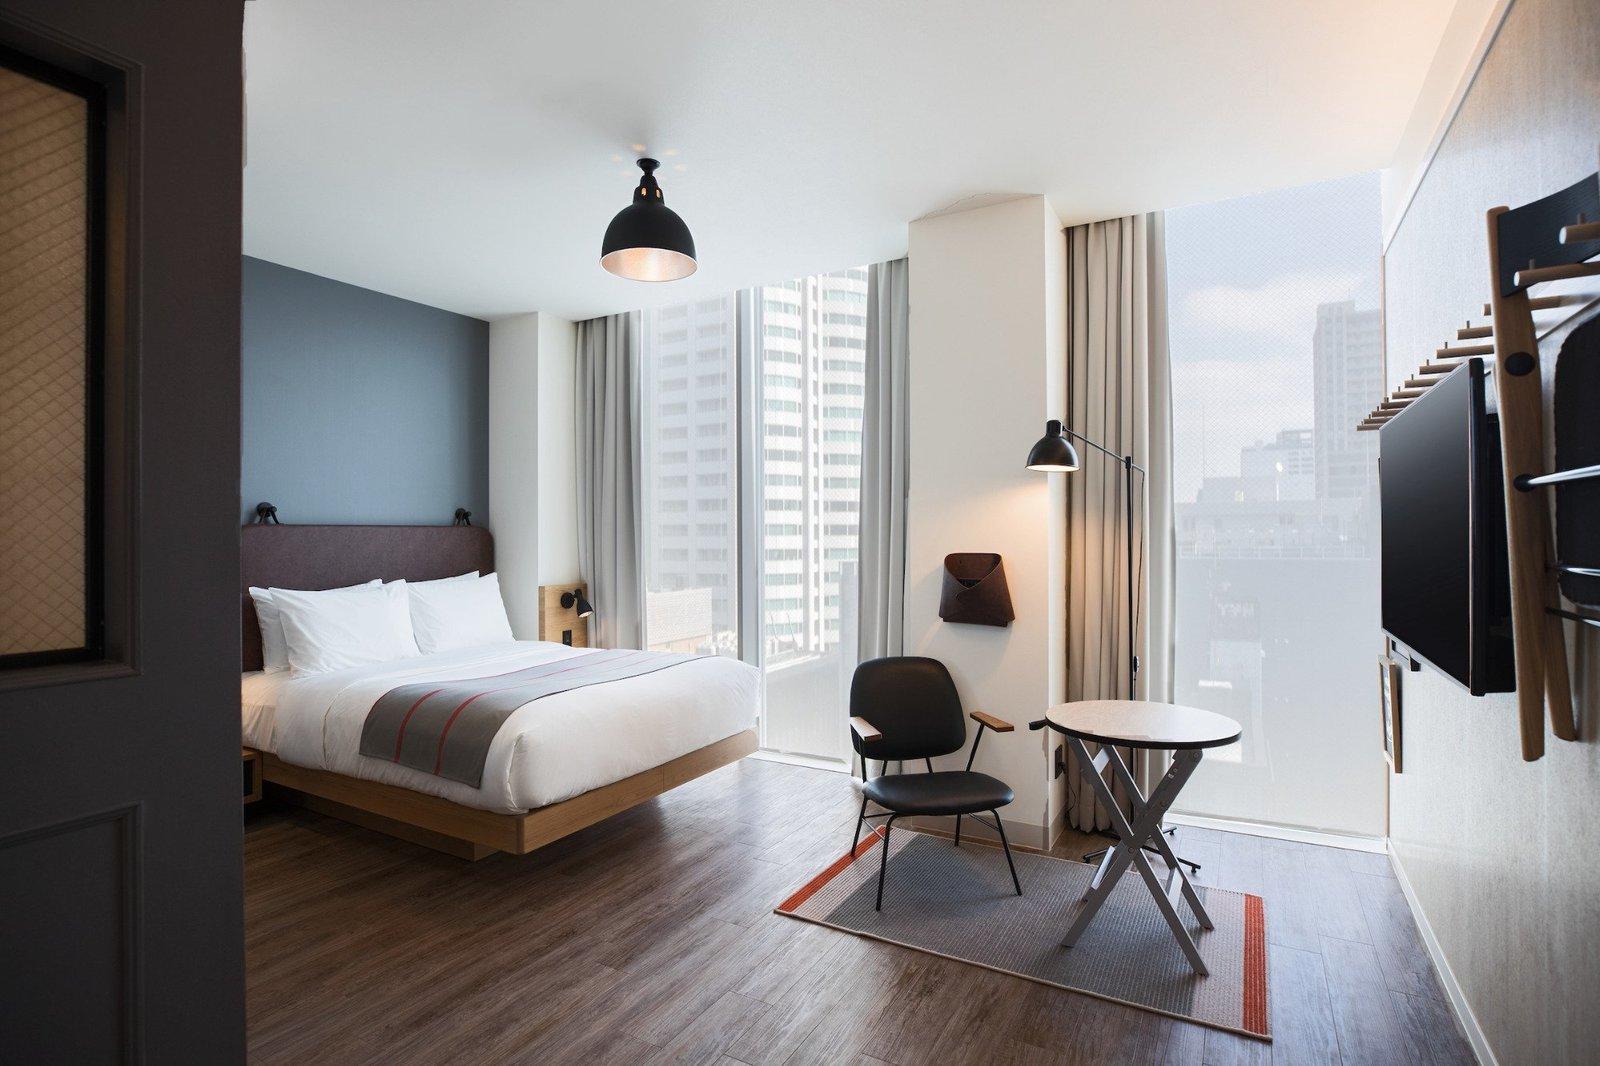 Bedroom, Chair, Rug Floor, Wall Lighting, Bed, Dark Hardwood Floor, Ceiling Lighting, and Floor Lighting  Moxy Osaka Honmachi